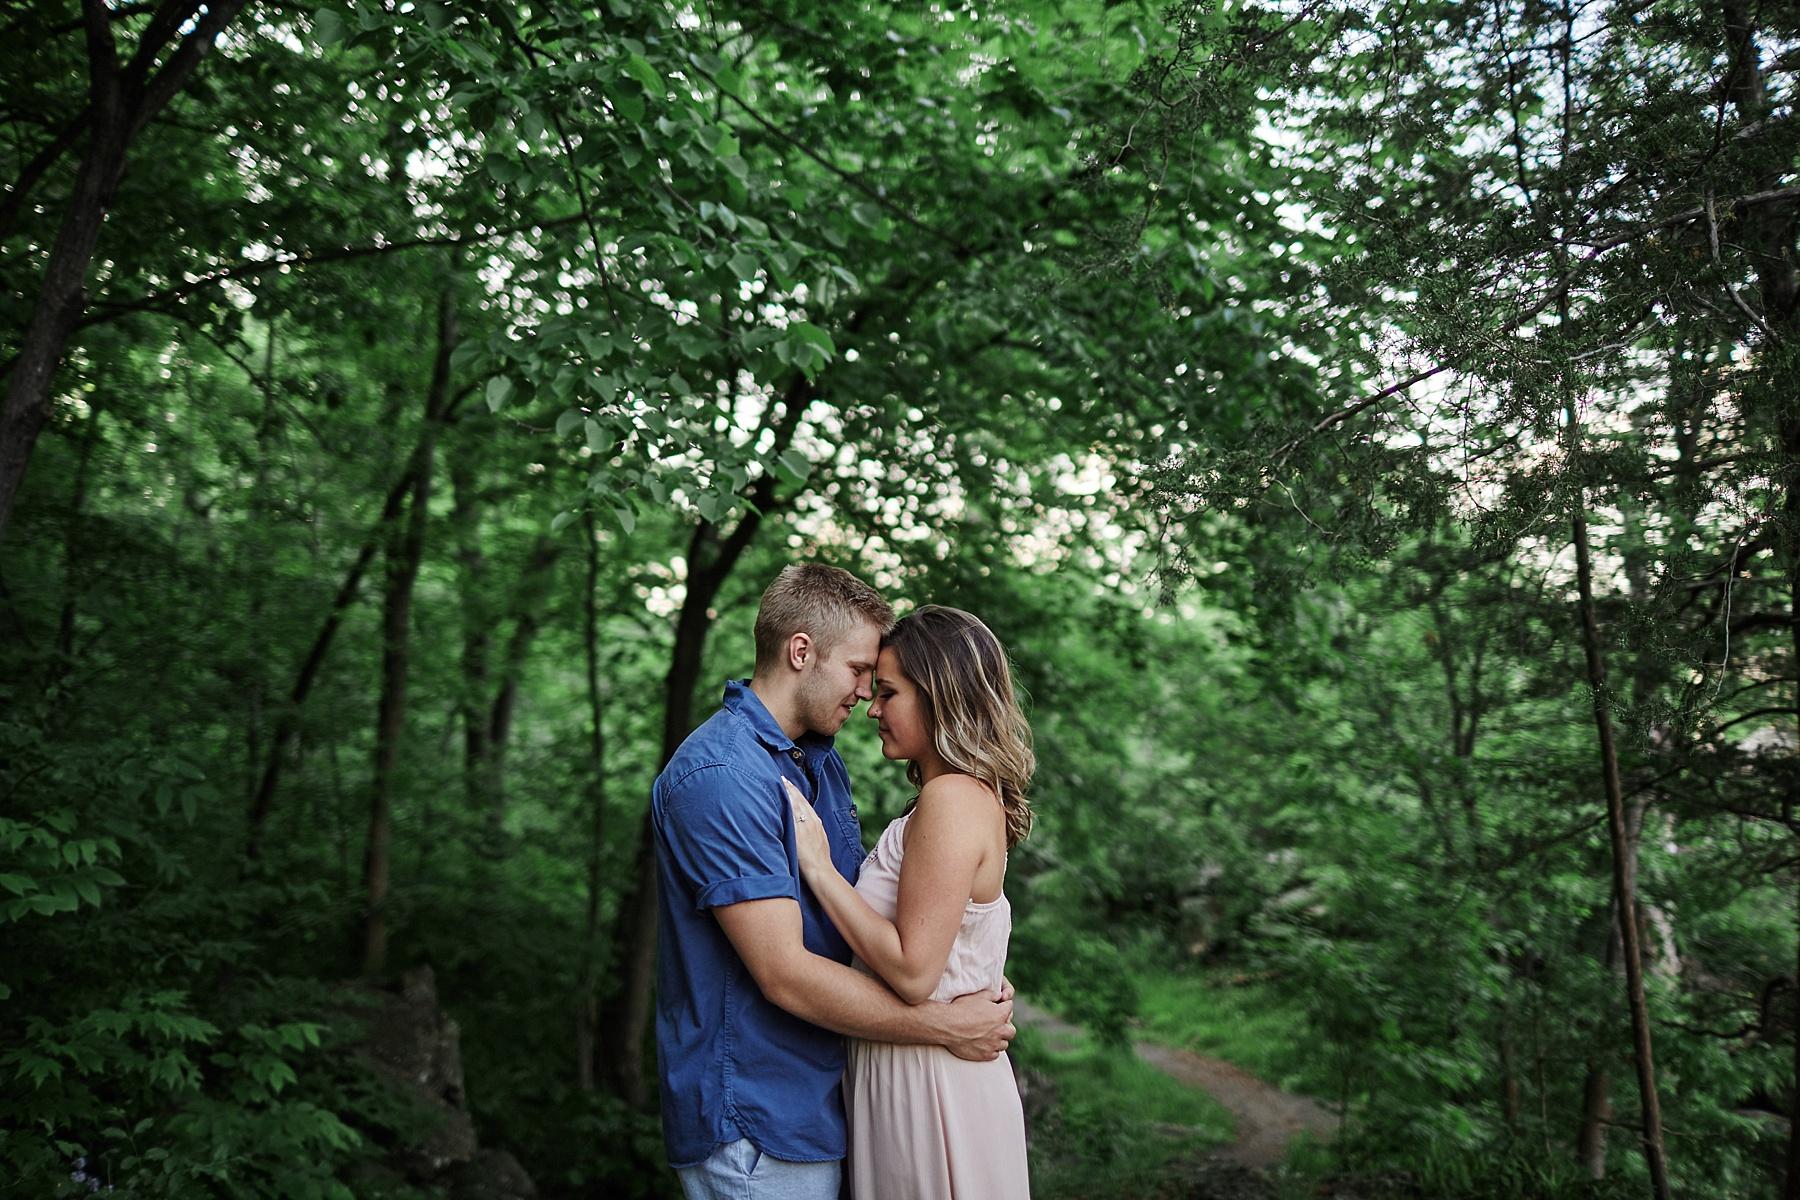 Destination-Engagement-Taylors-Falls-Minnesota-Minneapolis-Mayowood-Stone-Barn_0064.jpg